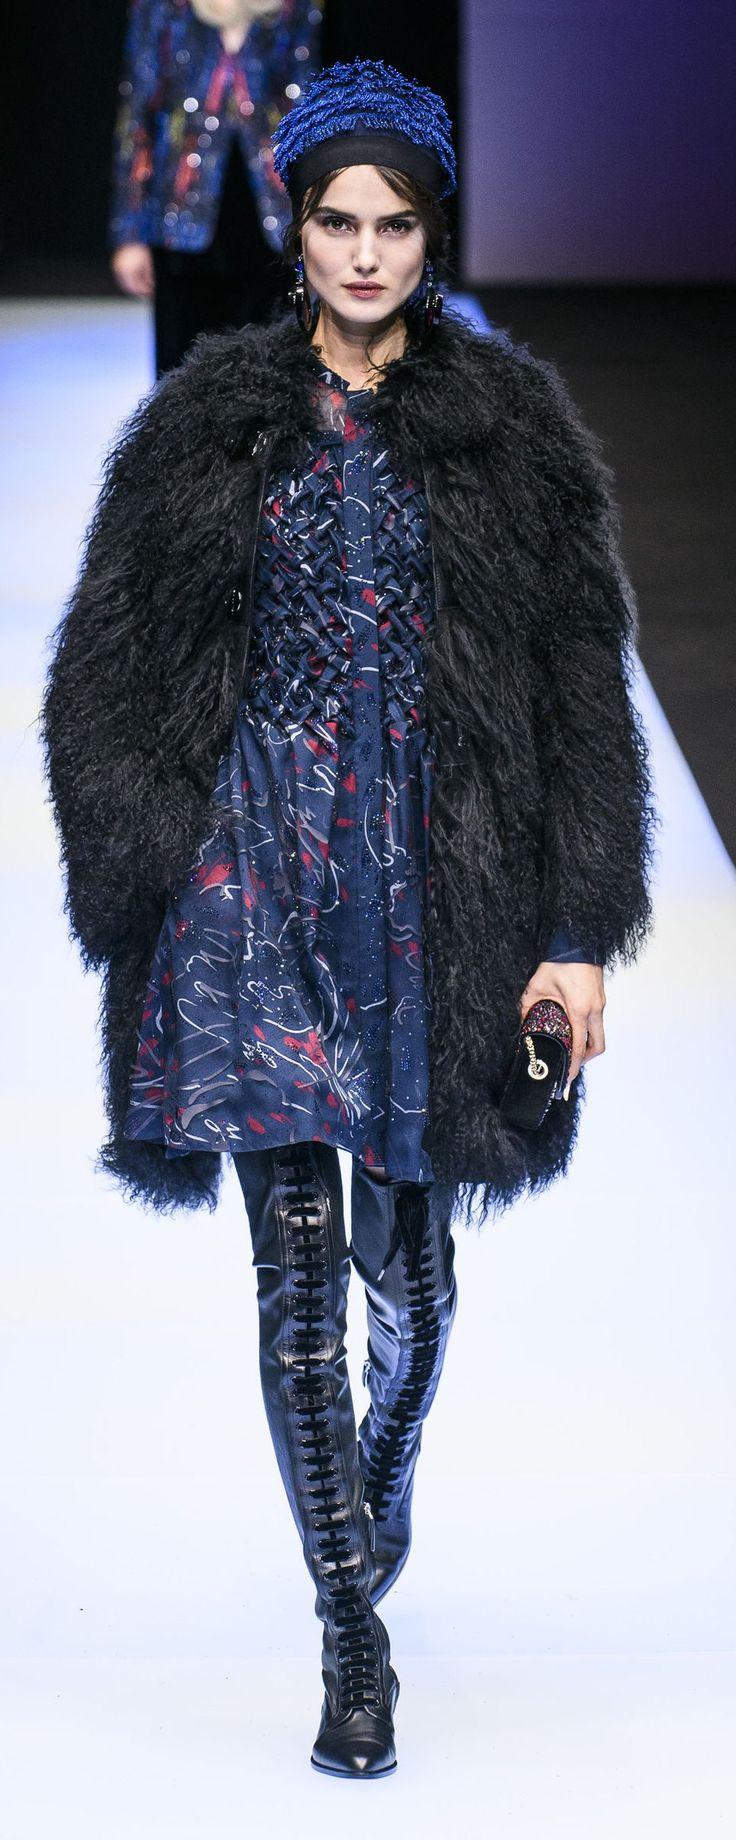 Giorgio Armani Fall-winter 2018-2019 - Ready-to-Wear - http://www.orientpalms.com/Giorgio-Armani-7151 - ©ImaxTree